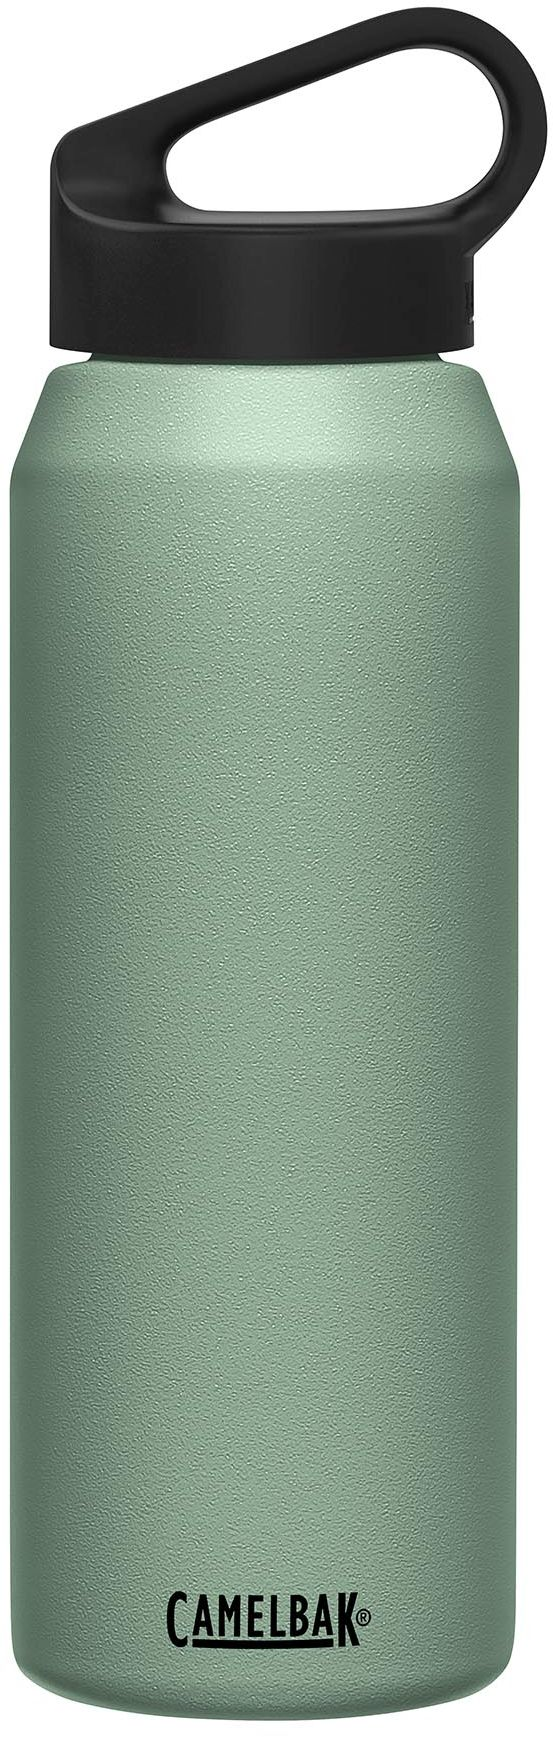 Camelbak Carry Cap Vacuum Stainless 0,6L - Moss uni